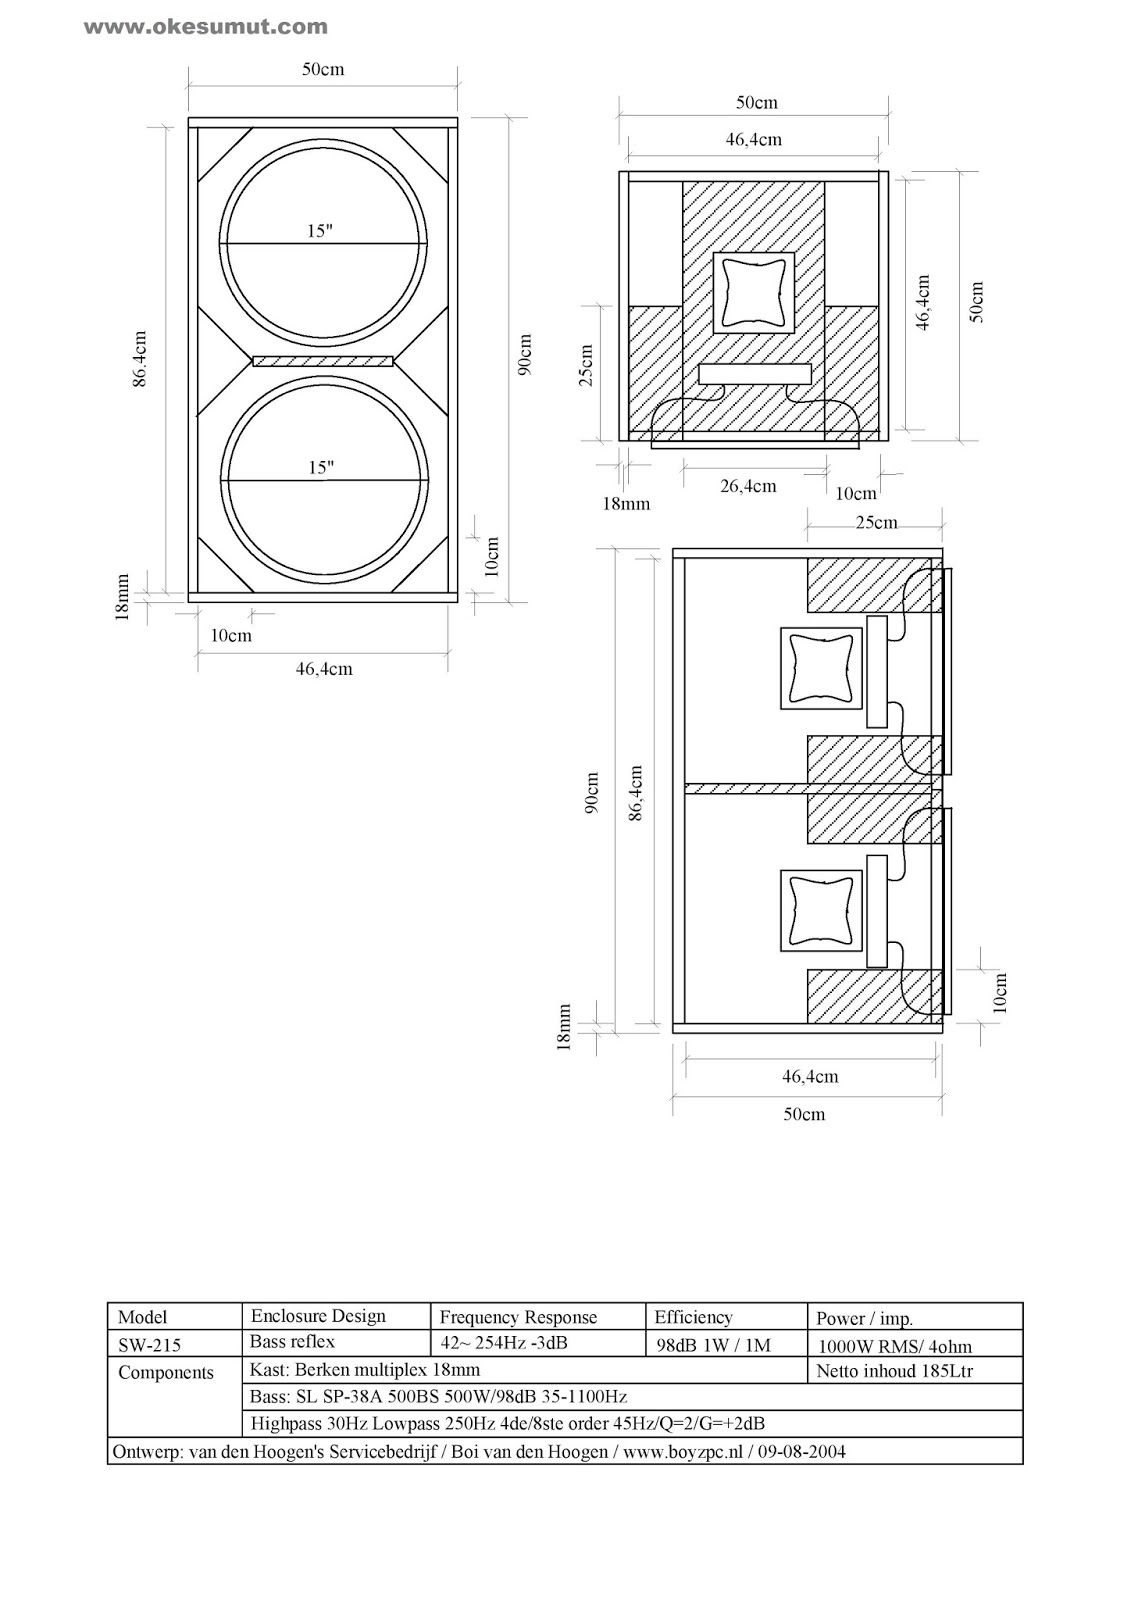 small resolution of box speaker 15x2 bass selamat datang sebelumnya di oeksumut disini diagram chart box speaker